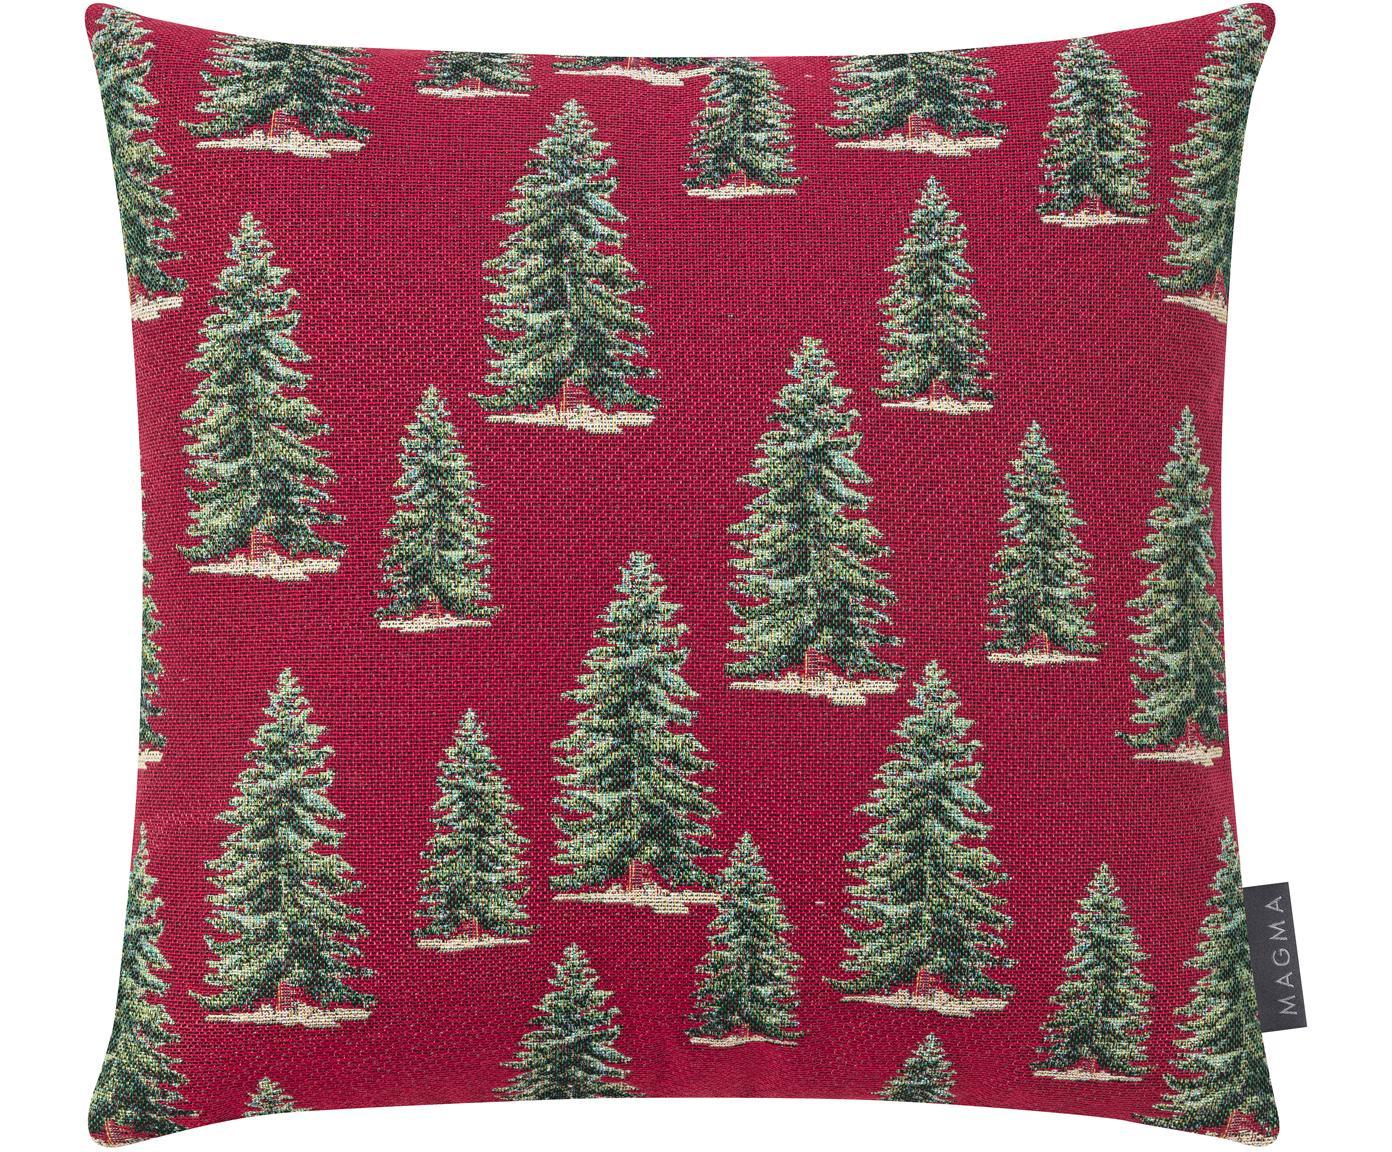 Federa arredo rosso/verde Pinetree, Retro: velluto di poliestere, Rosso, verde, beige, Larg. 40 x Lung. 40 cm